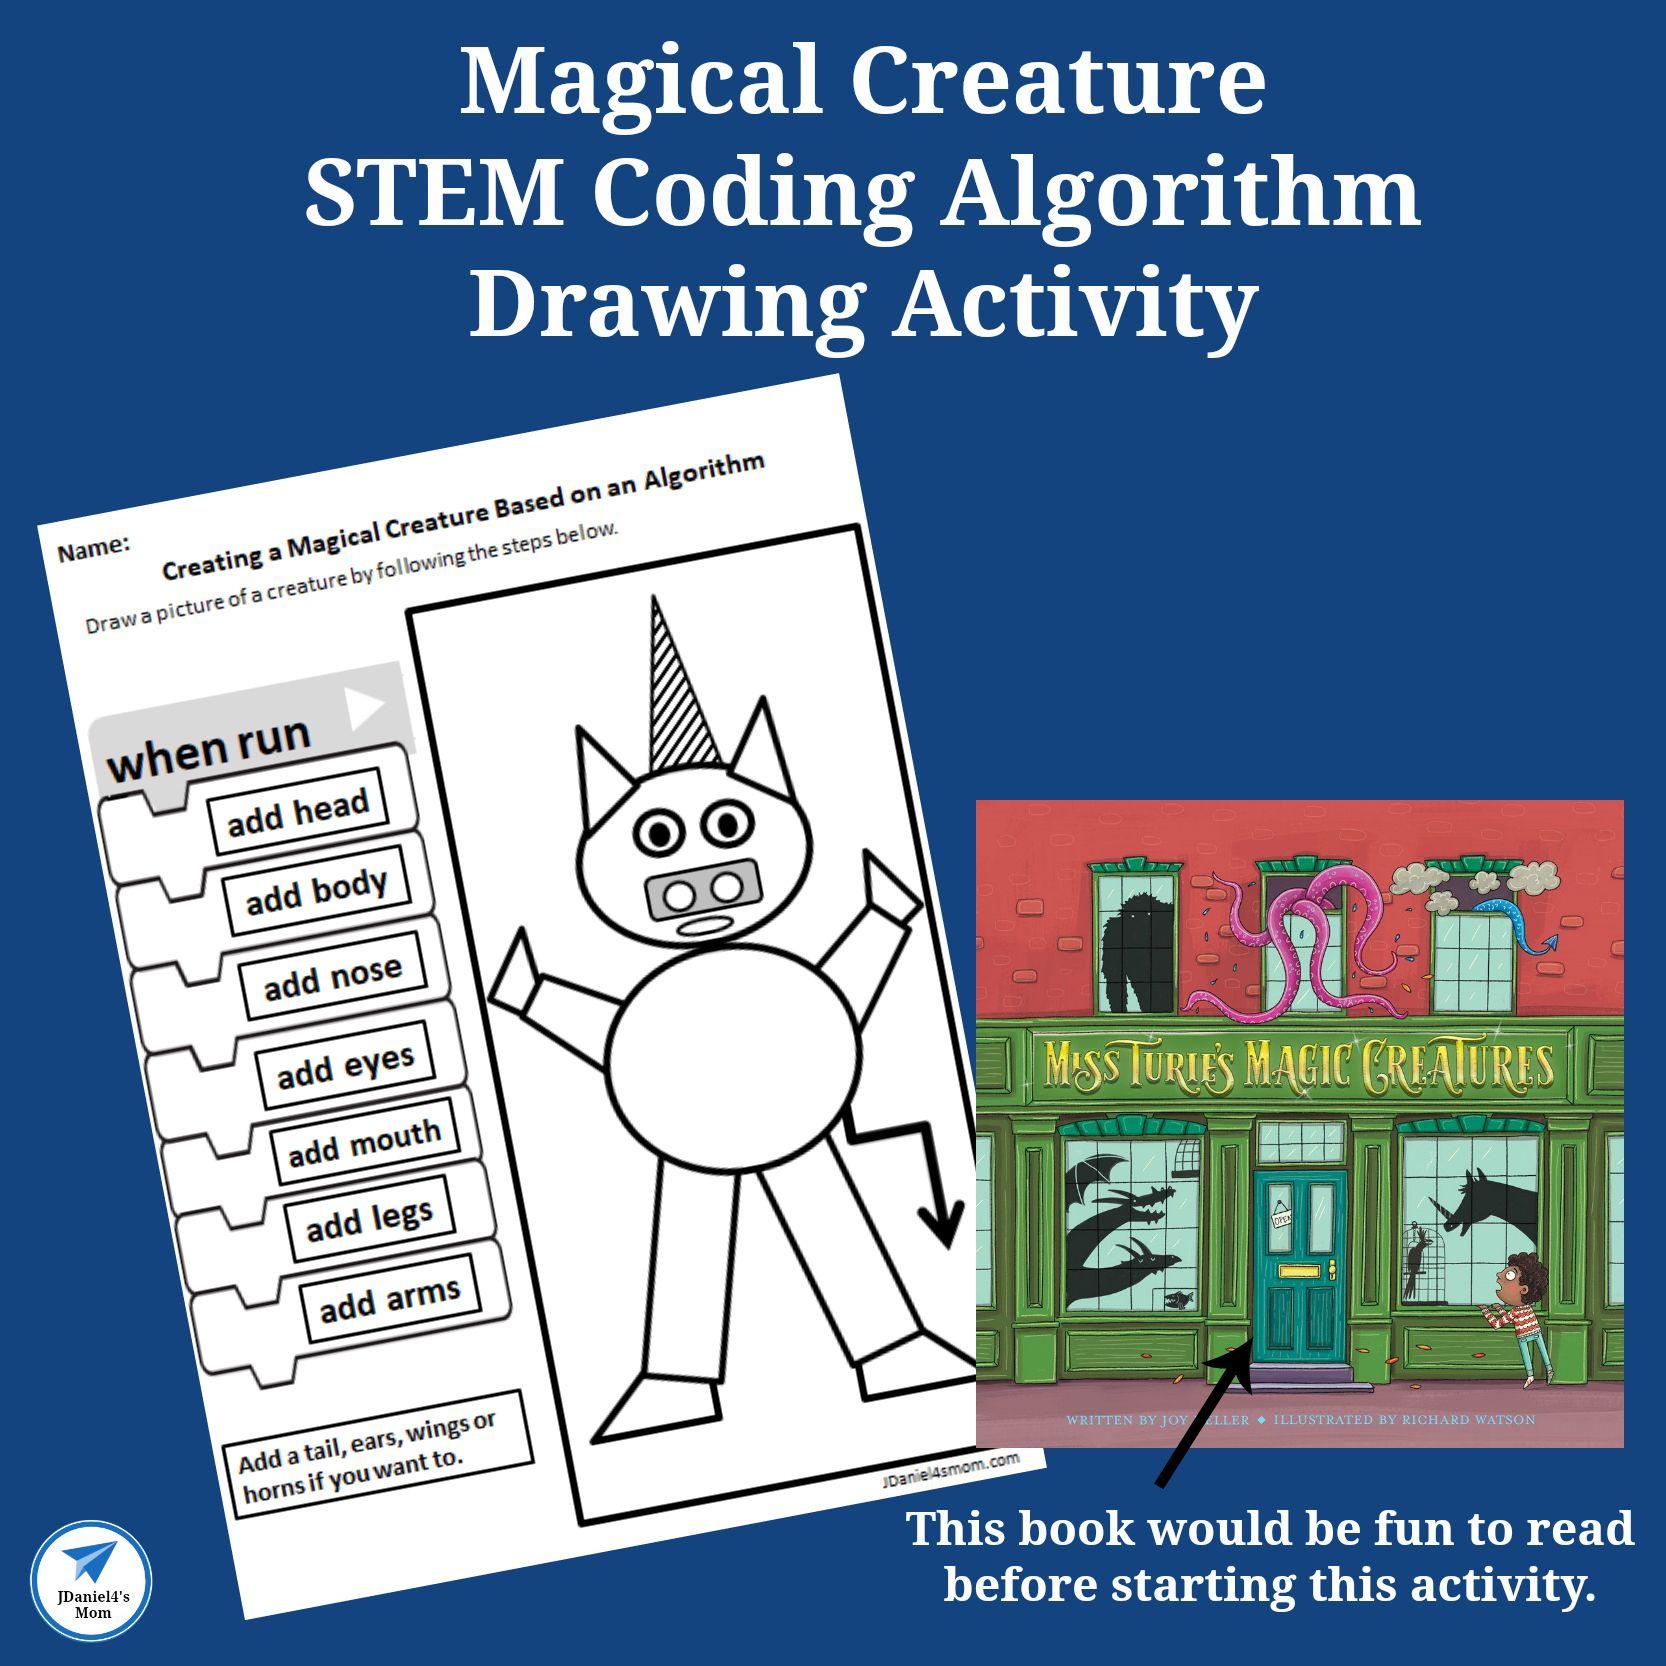 Magical Creatures Stem Coding Algorithm Drawing Activity